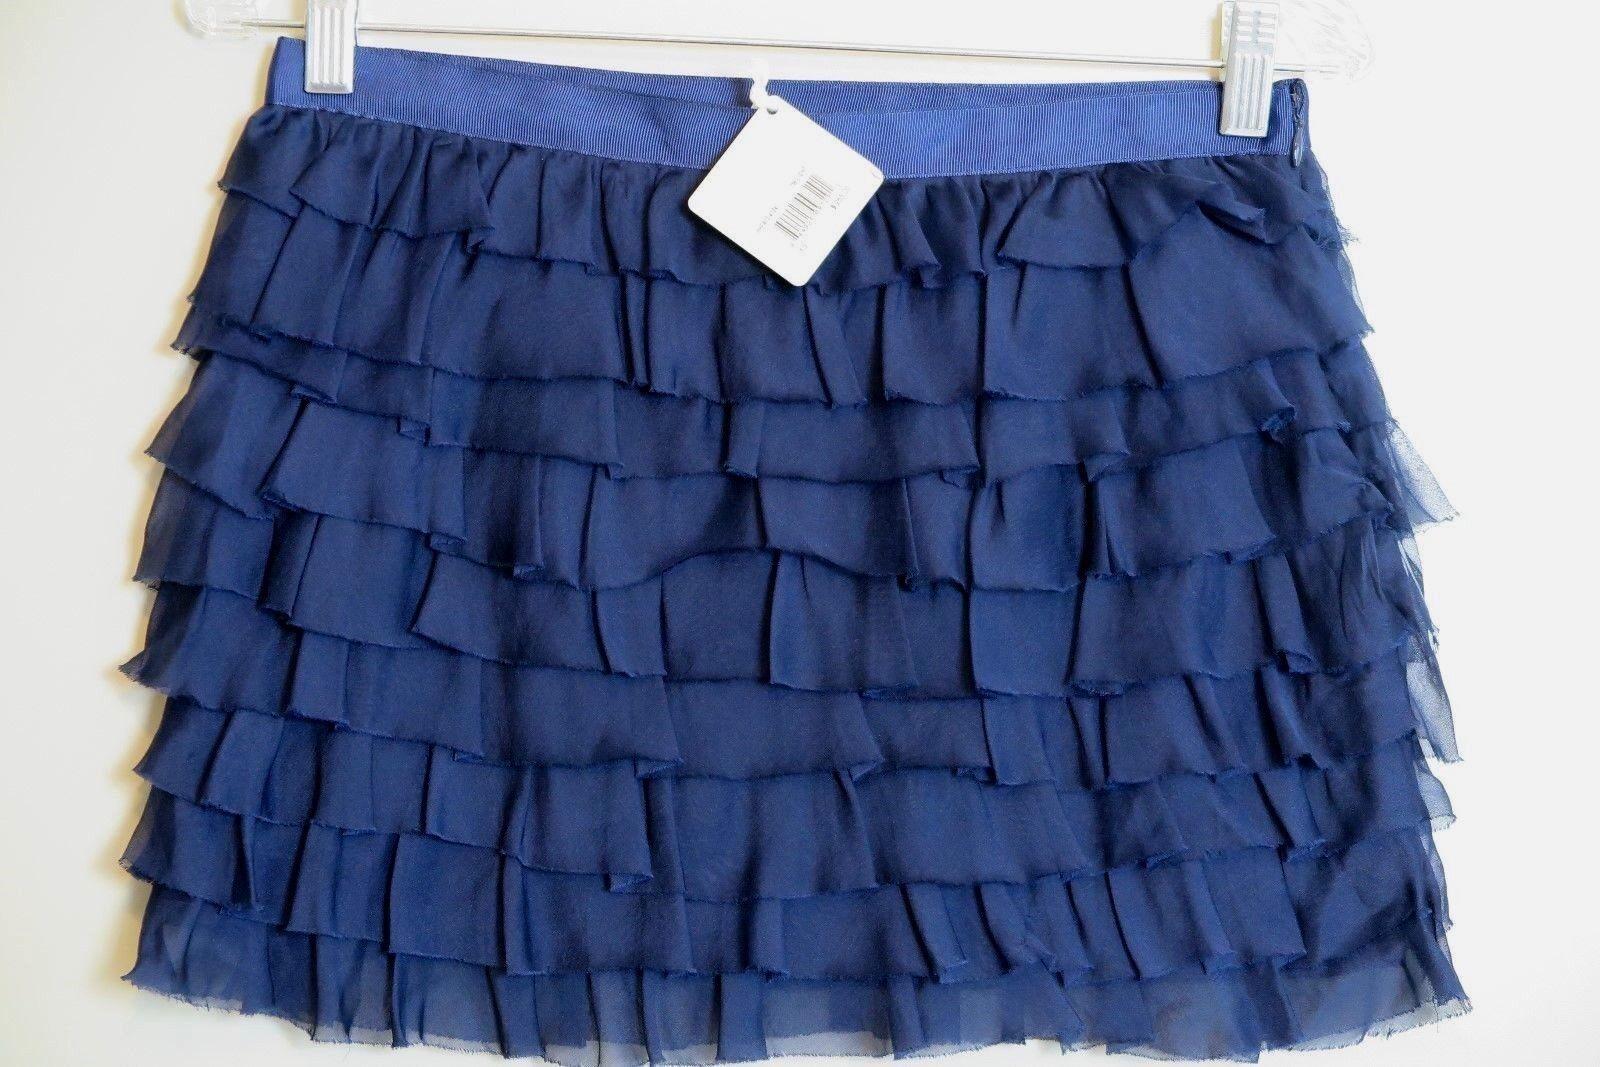 NWT Haute Hippie Twilight bluee 100% Silk Tiered Mini Skirt Size XS MSRP  265